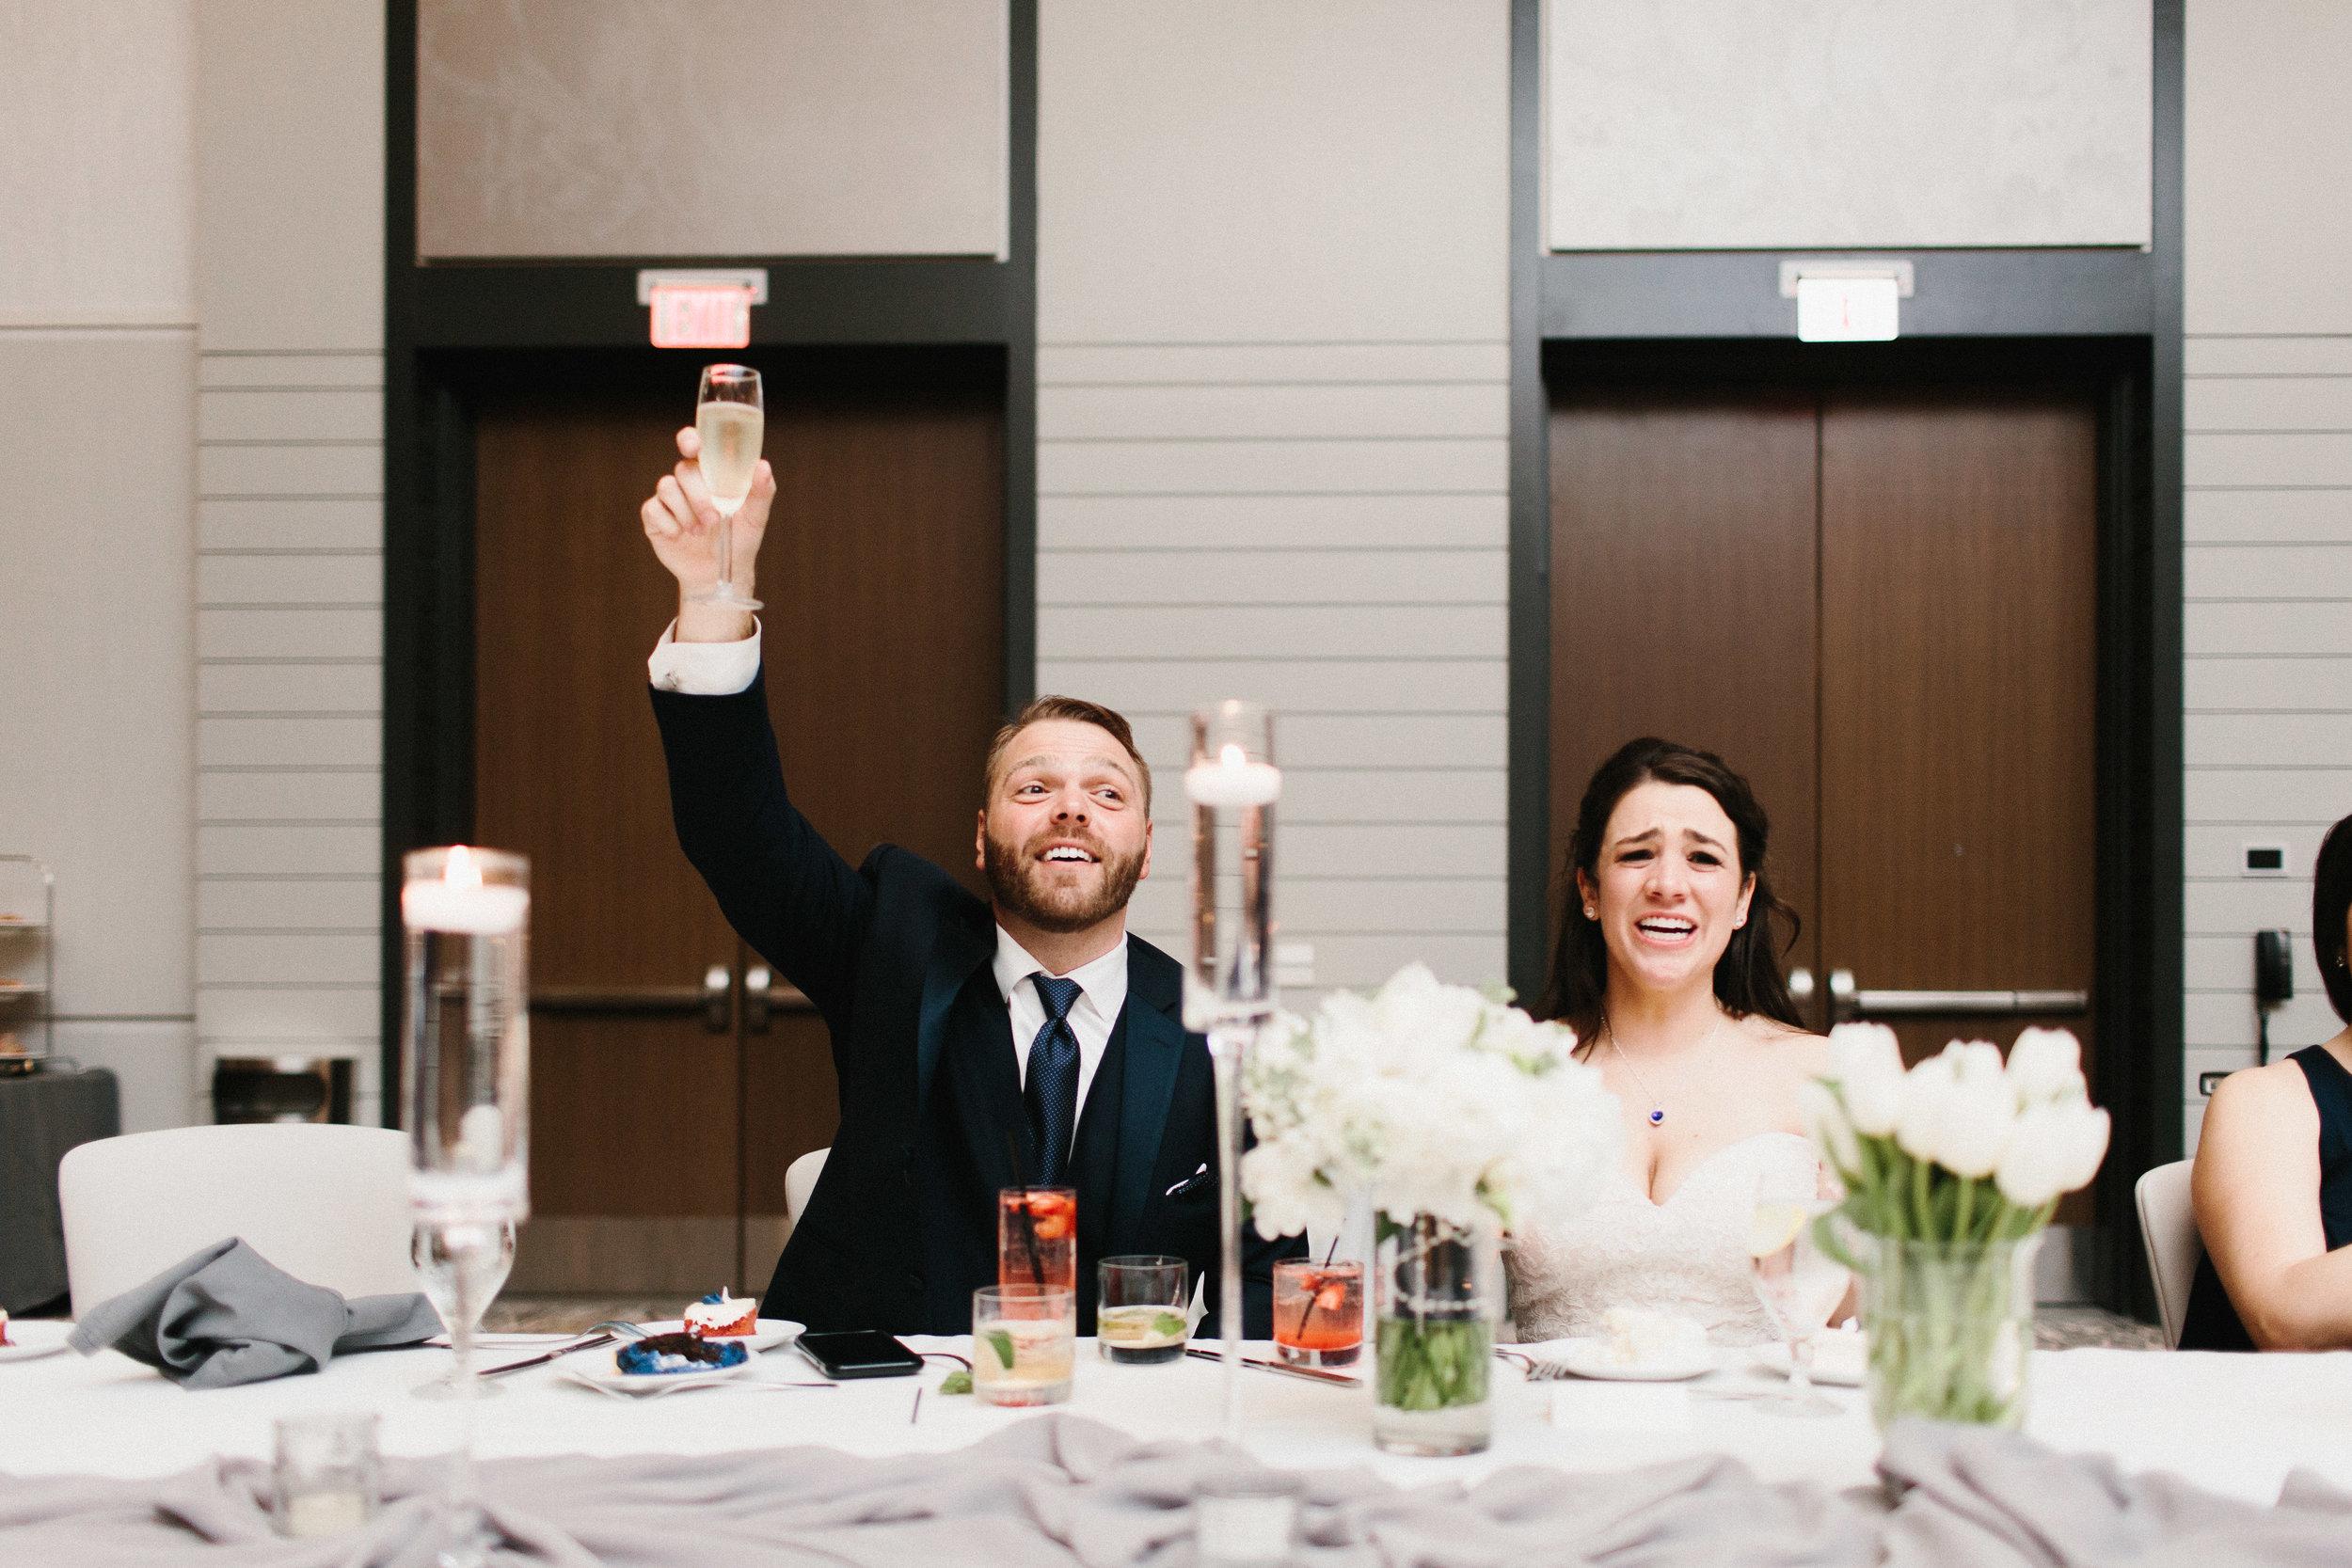 roswell_st_peter_chanel_catholic_avalon_hotel_alpharetta_wedding-2135.jpg